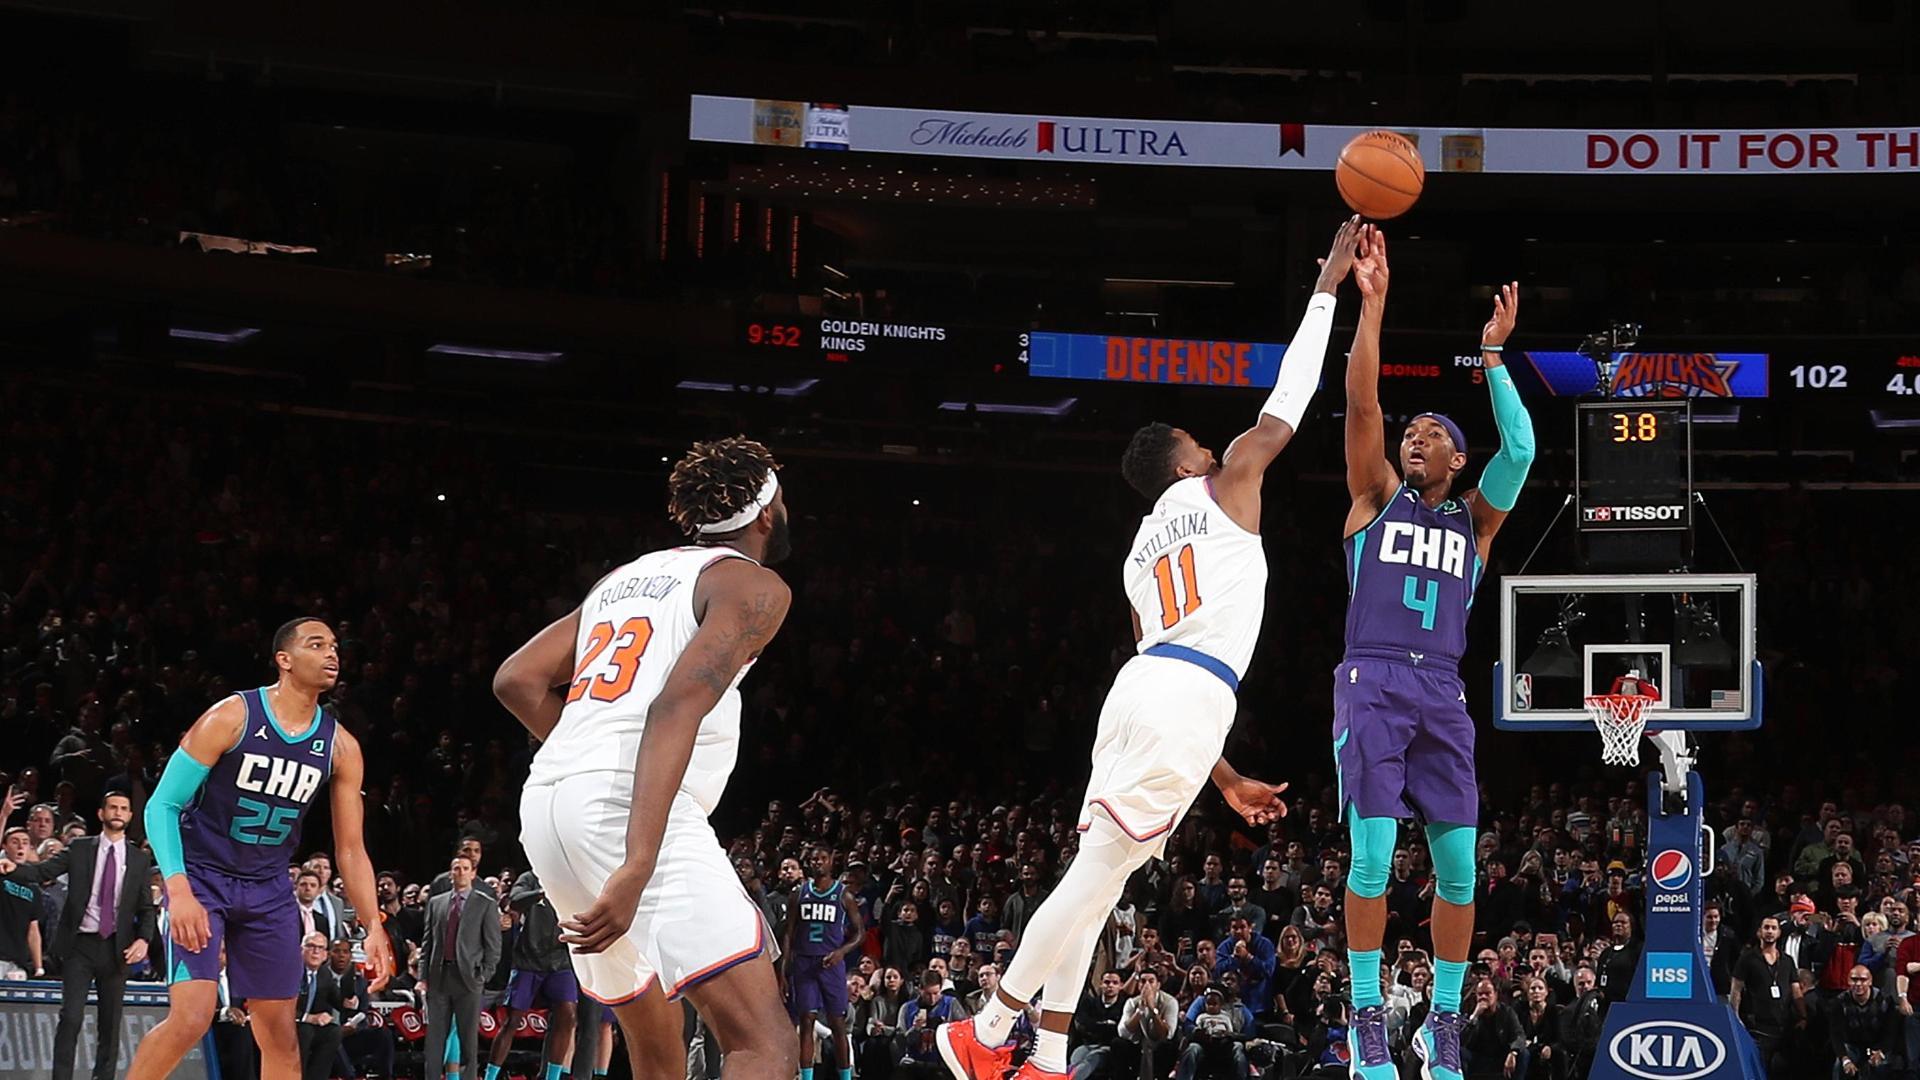 Graham's deep 3 beats Knicks